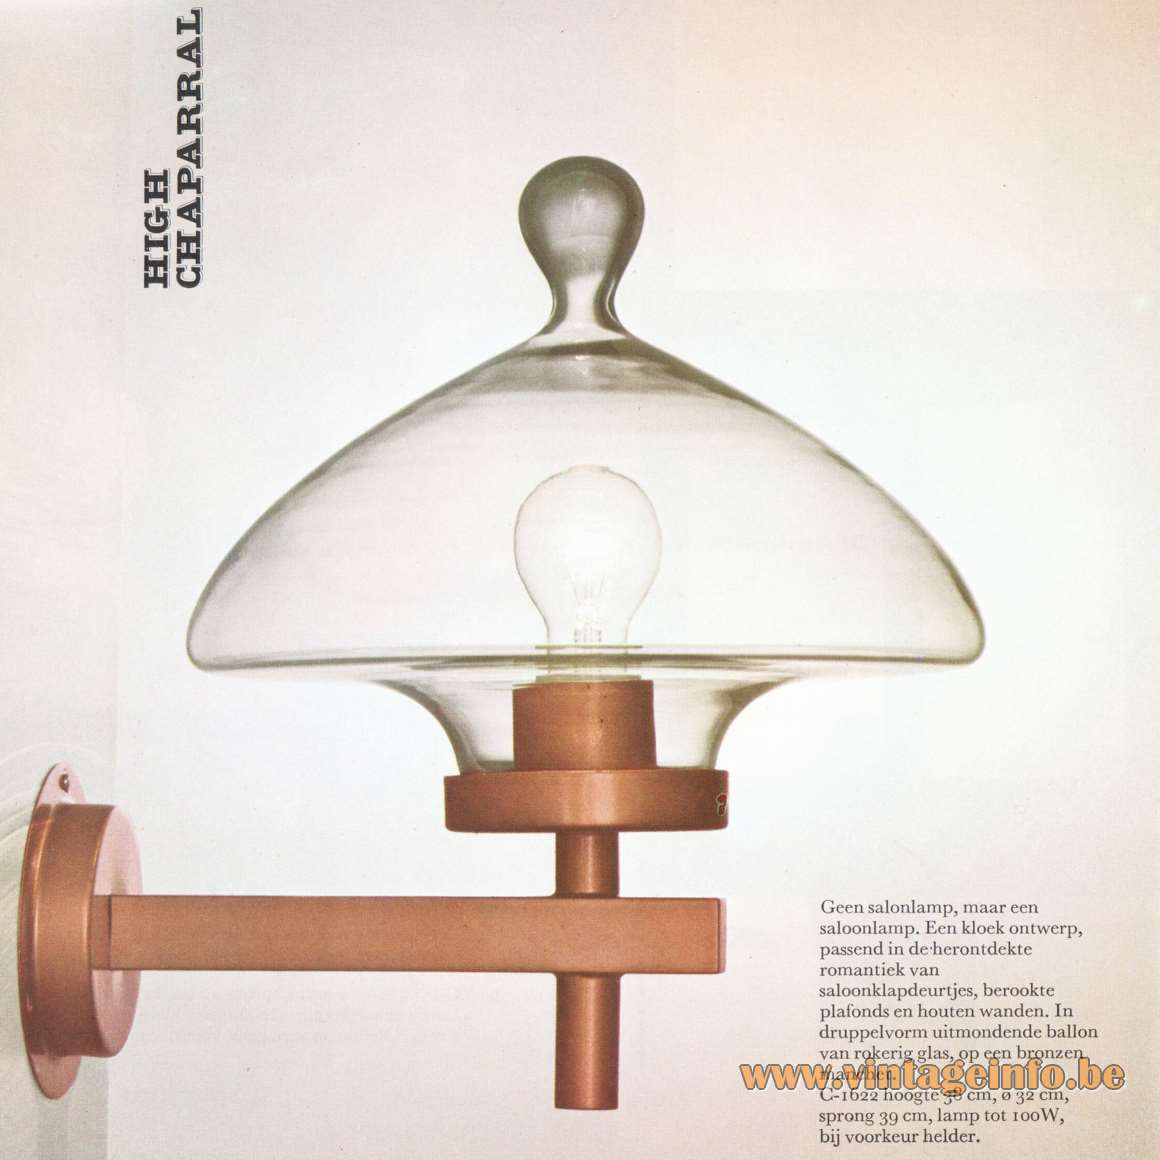 Raak Catalogue 8 - 1968 - High Chaparral Droplet Wall Lamp